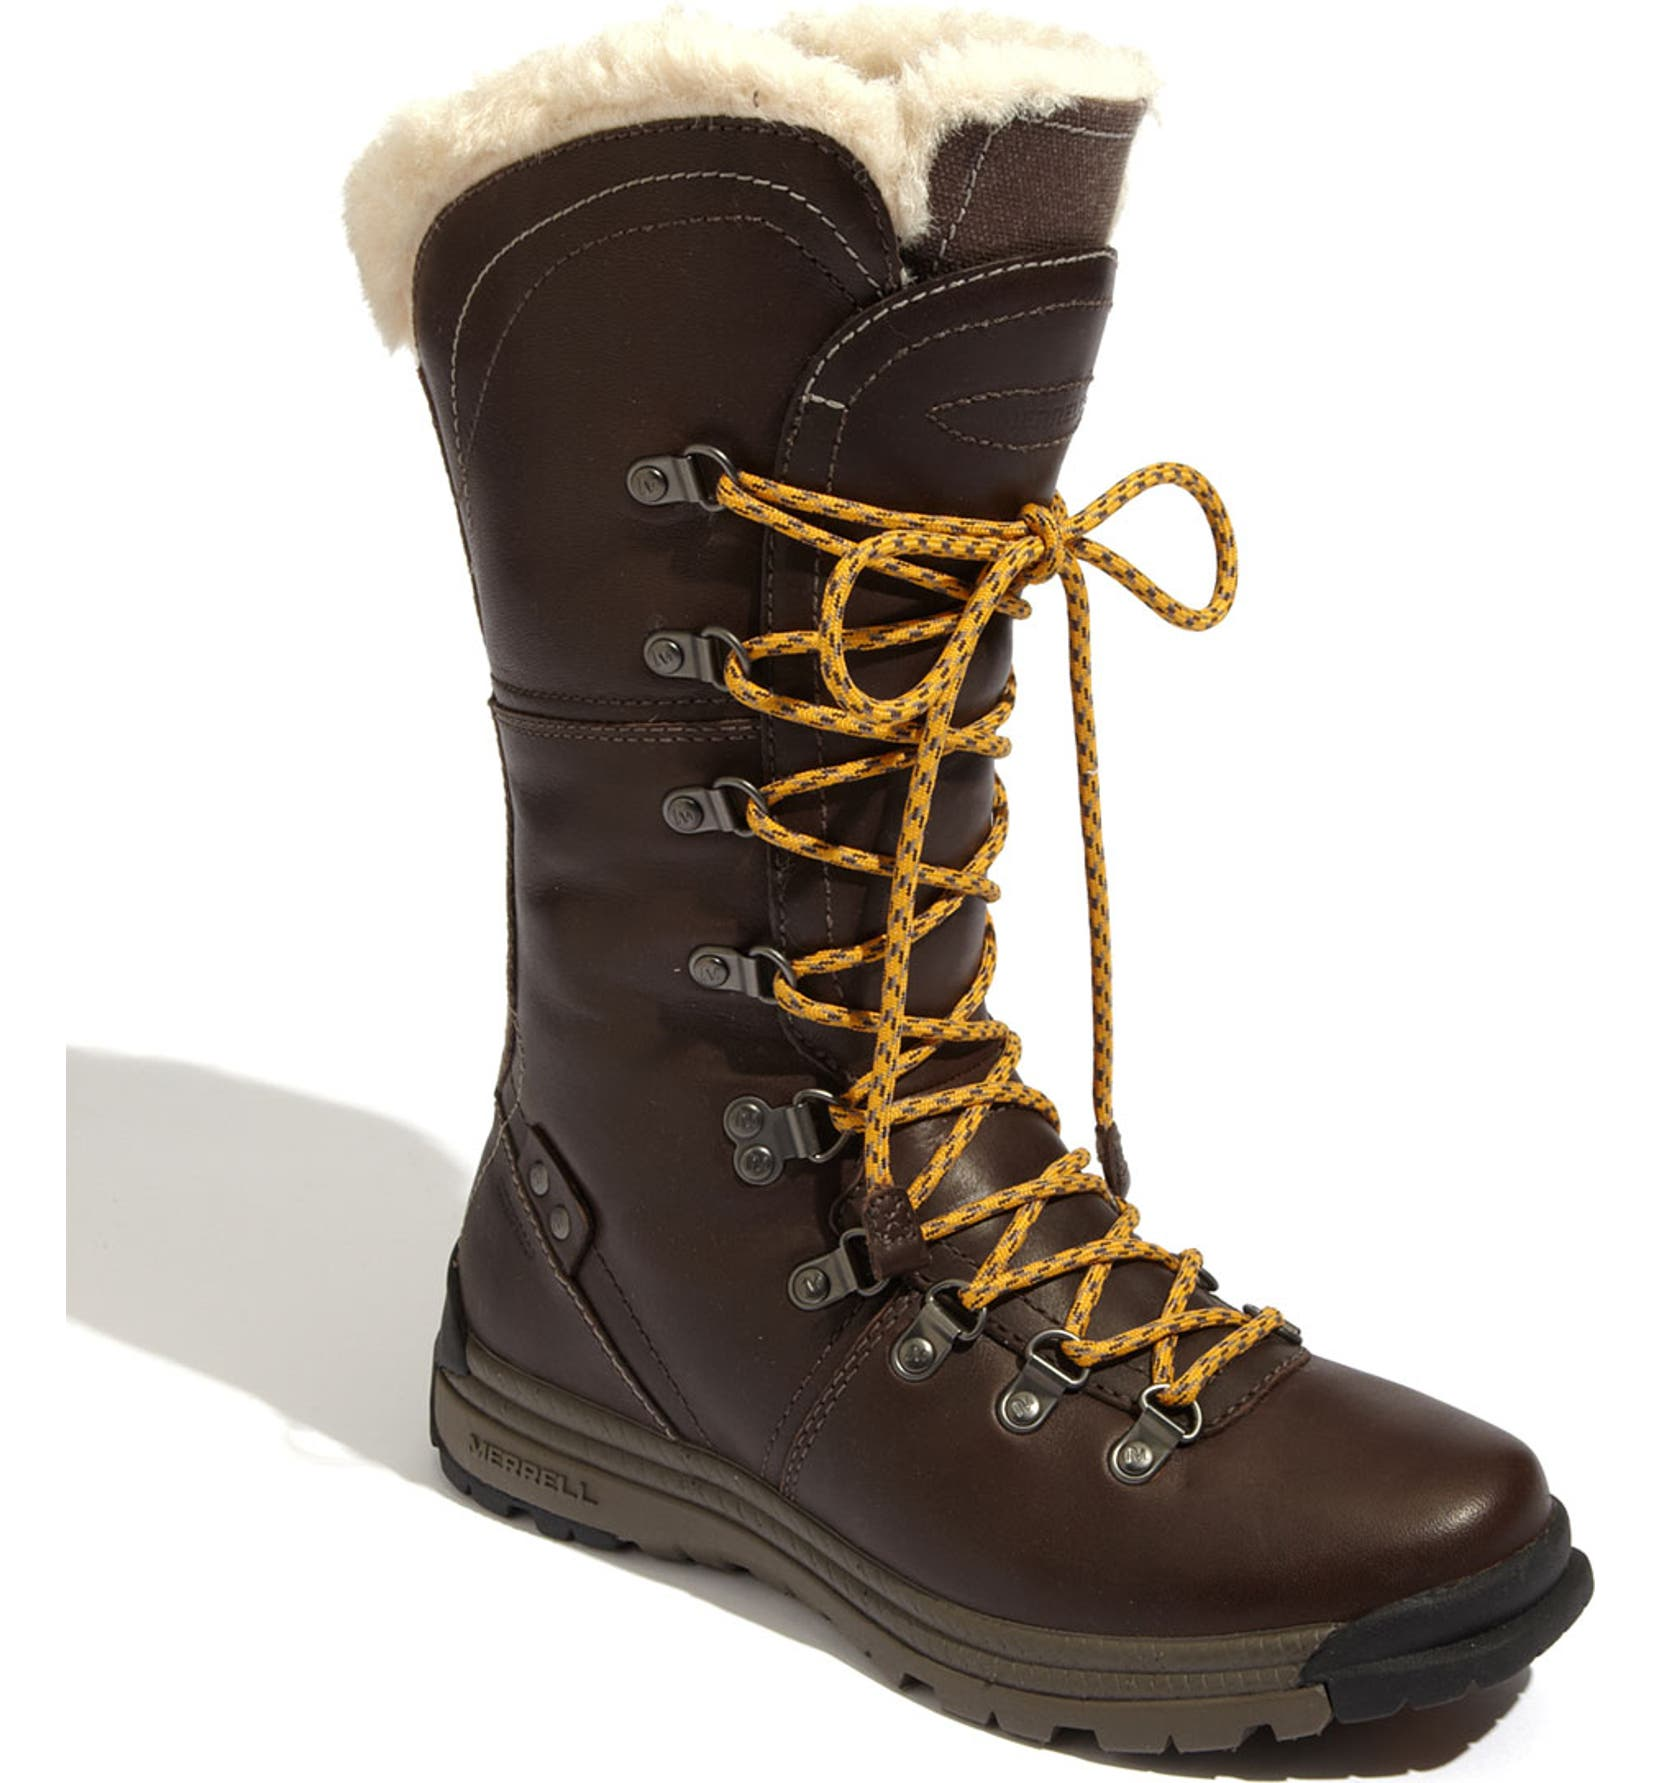 8613141c 'Natalya' Waterproof Boot